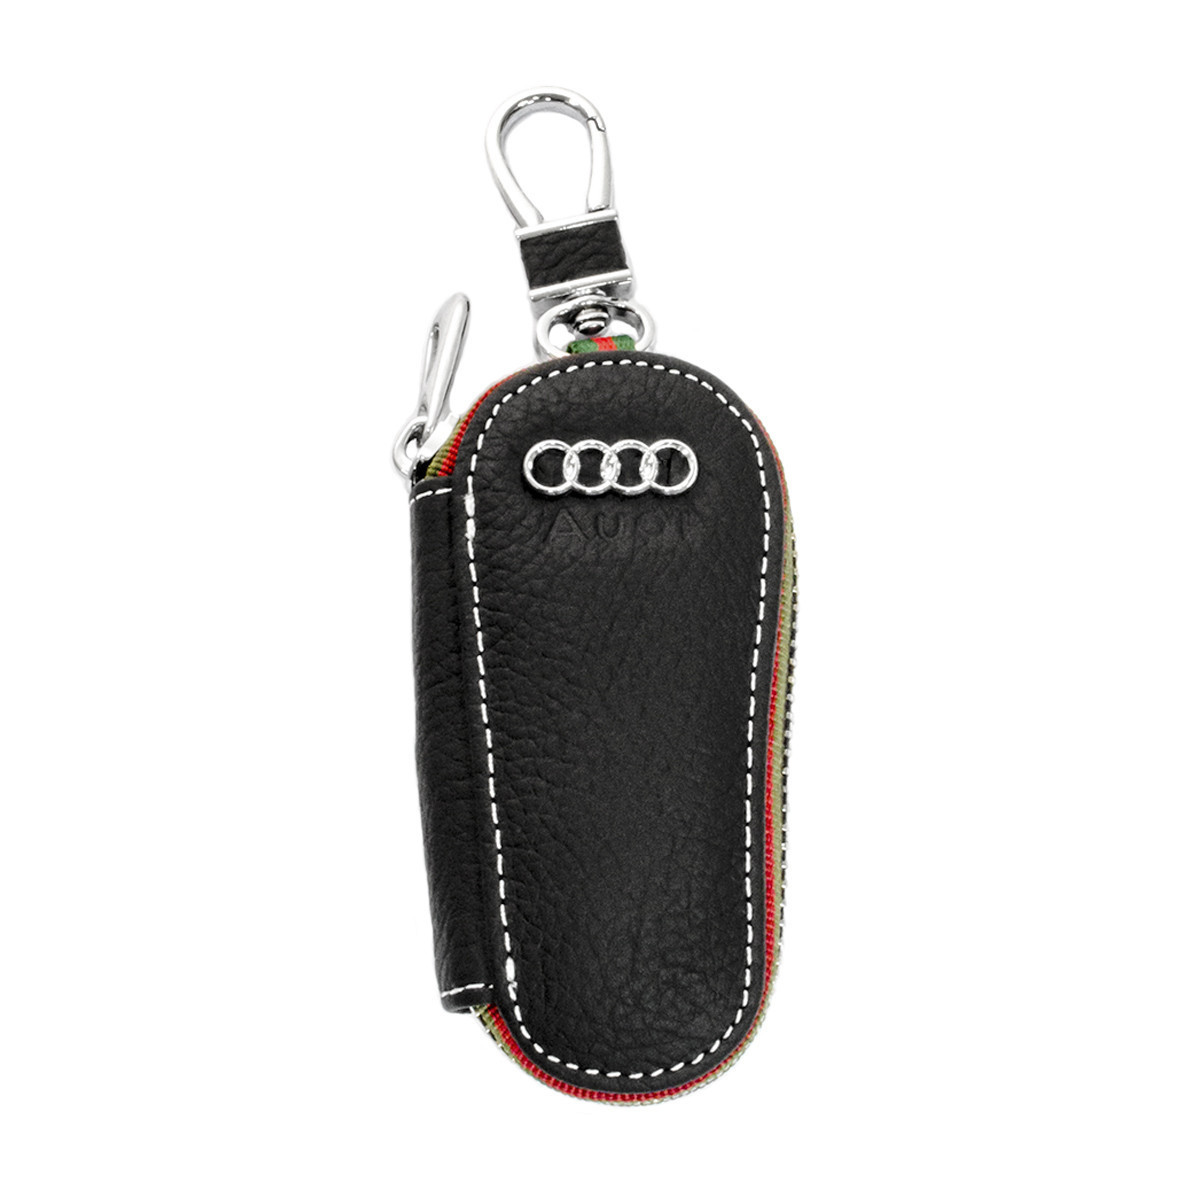 Ключница Carss с логотипом AUDI 01005 черная